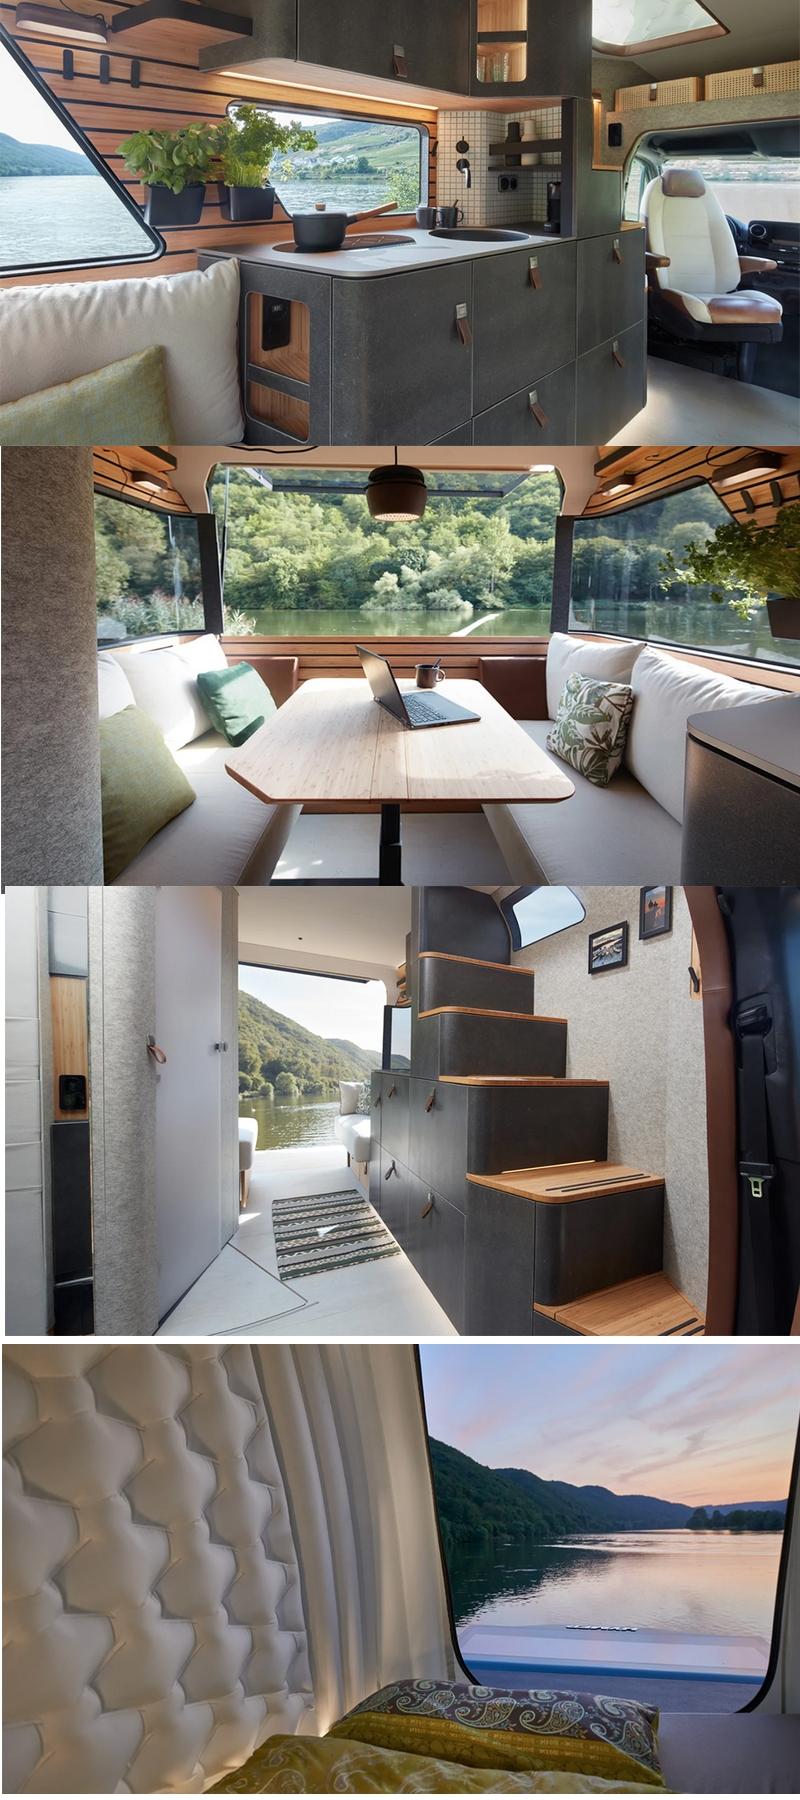 Basf x Hymer Van interiors 2019